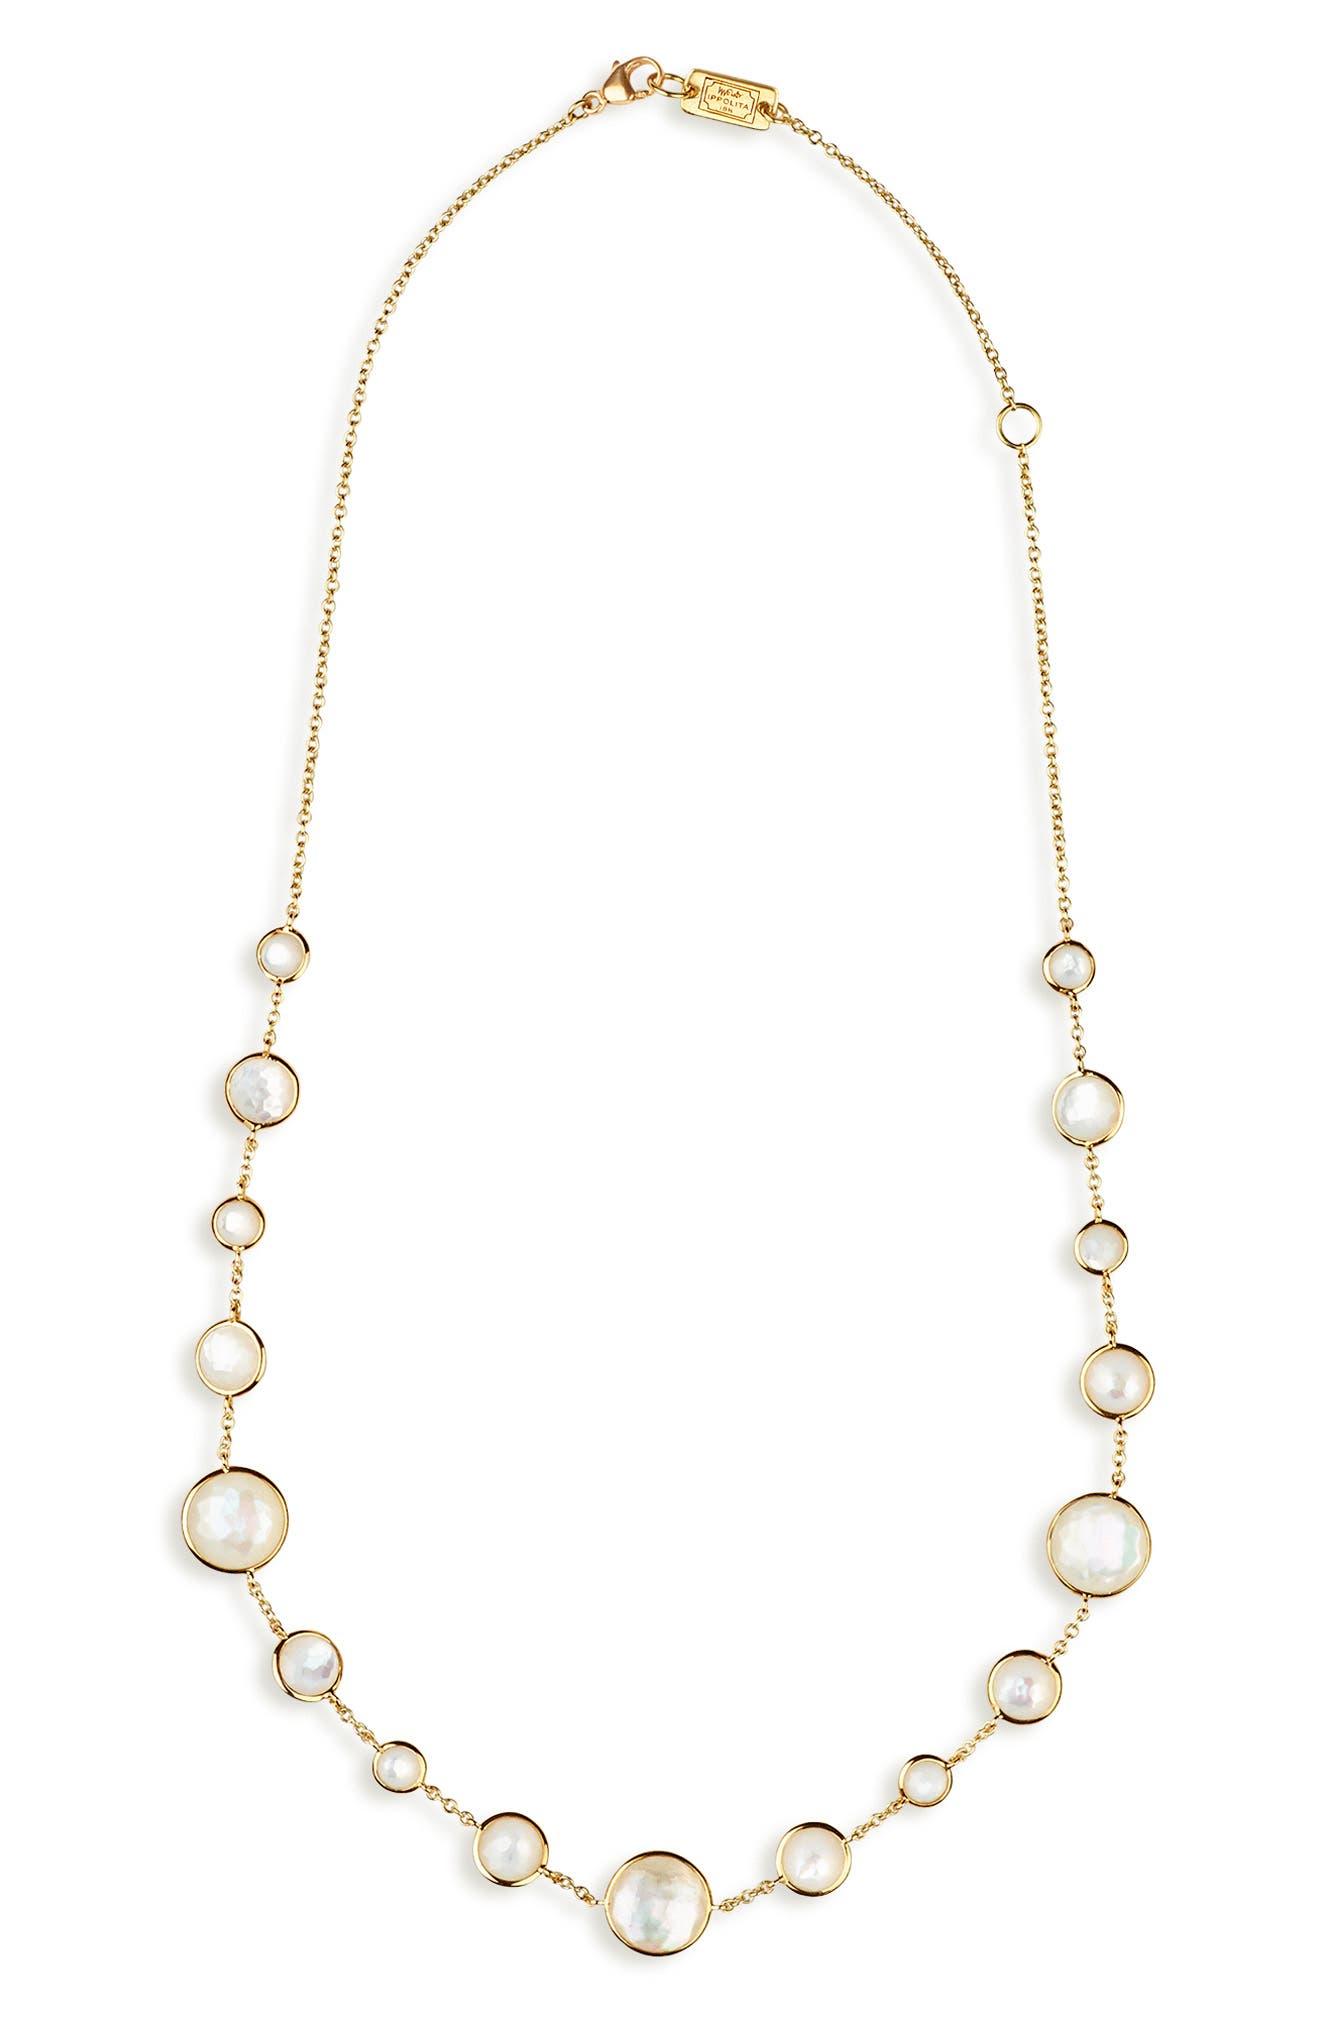 IPPOLITA,                             Lollipop Lollitini Necklace,                             Main thumbnail 1, color,                             GOLD/ PEARLS